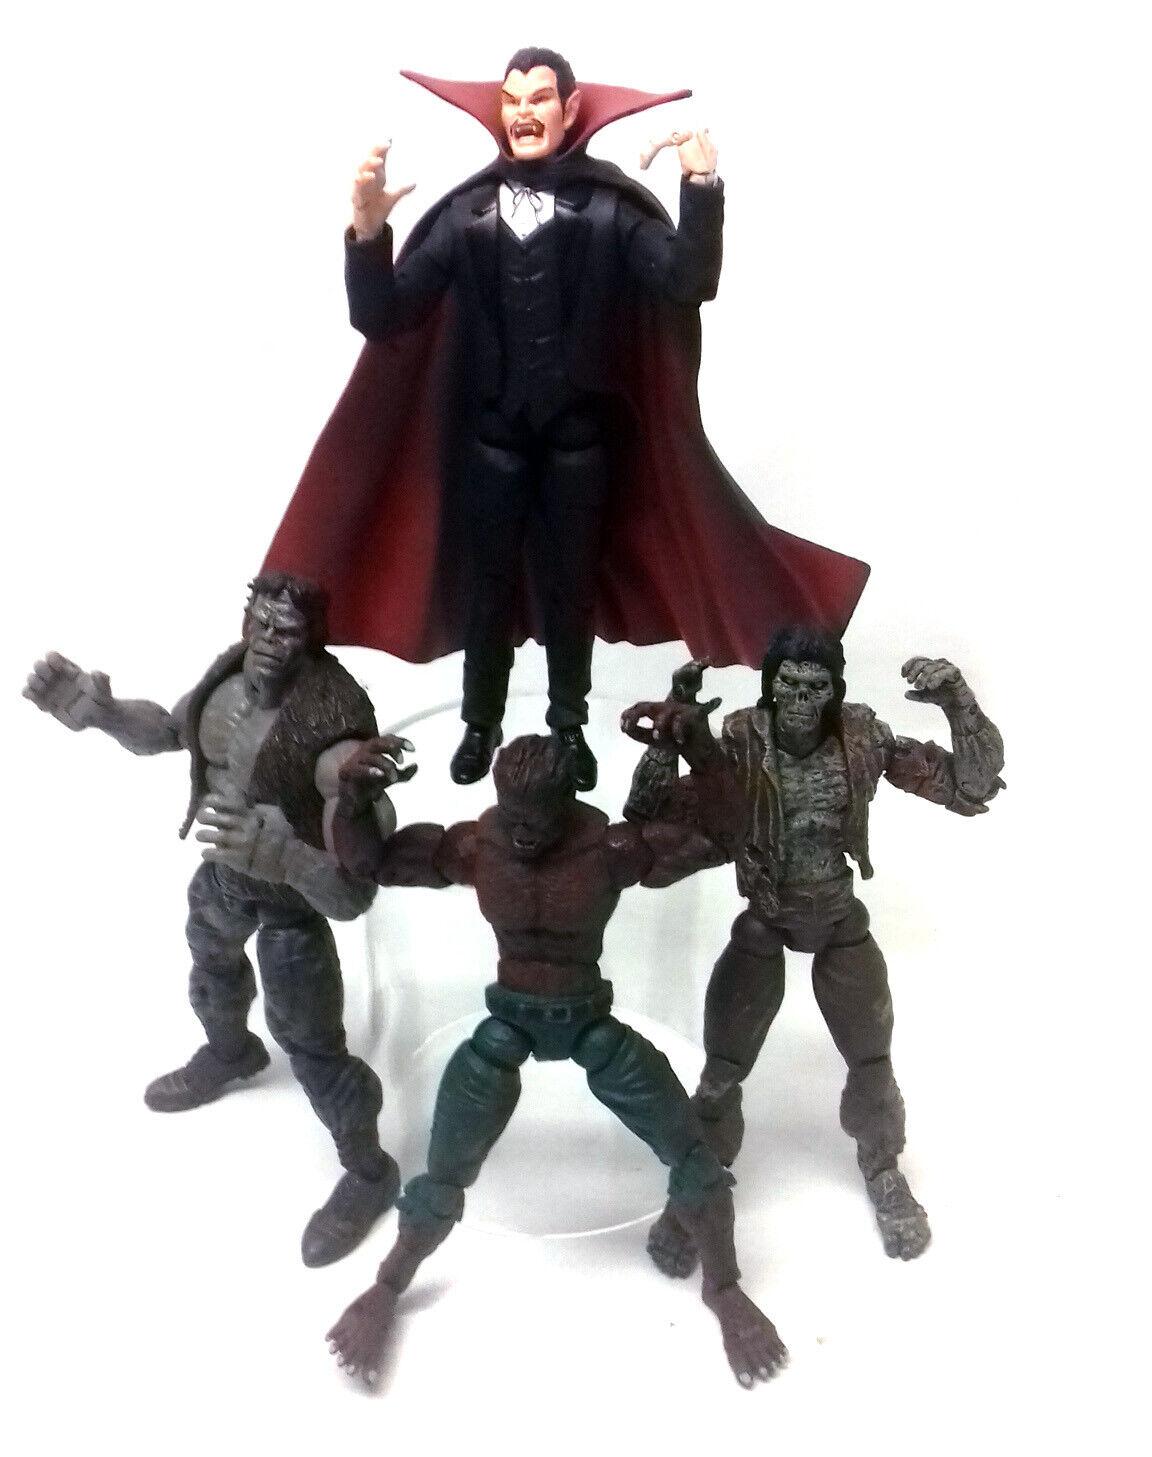 MARVEL Legends DEI MOSTRI-Lupo uomonaro, Dracula,  frankenstein, Zombie cifra Set  vendite online